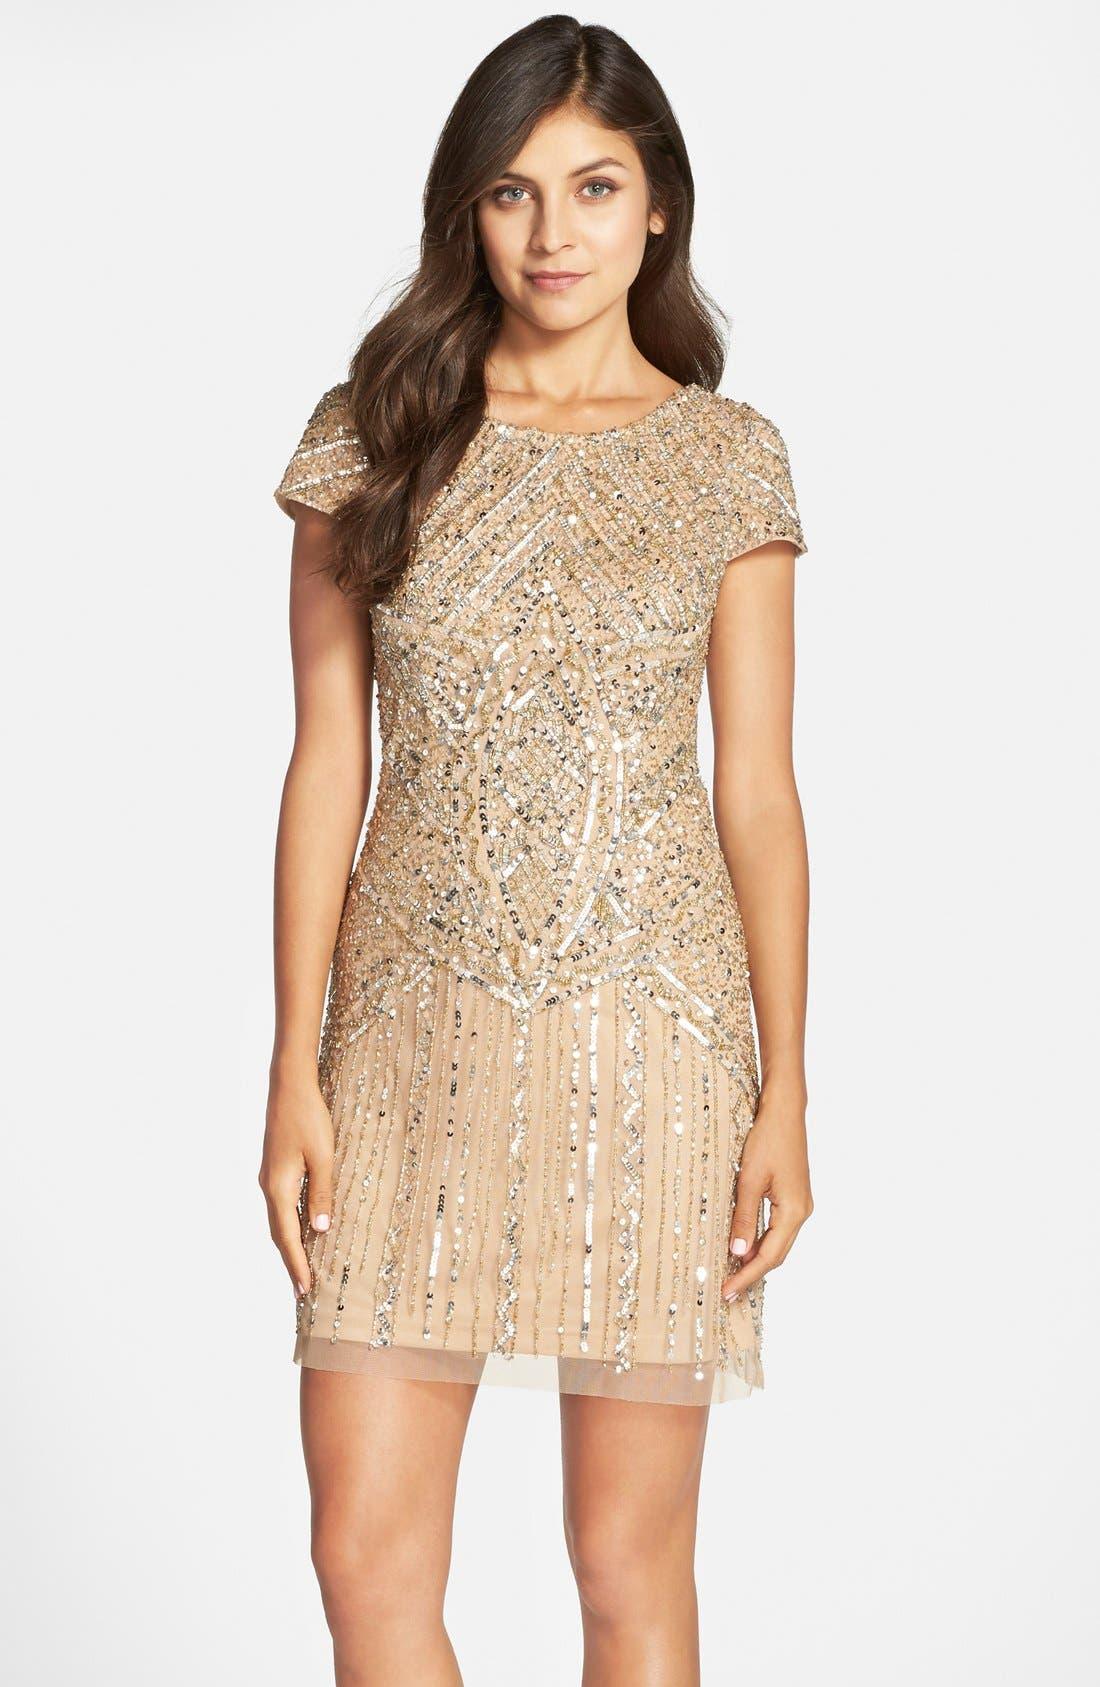 Alternate Image 1 Selected - Adrianna Papell Embellished Sheath Dress